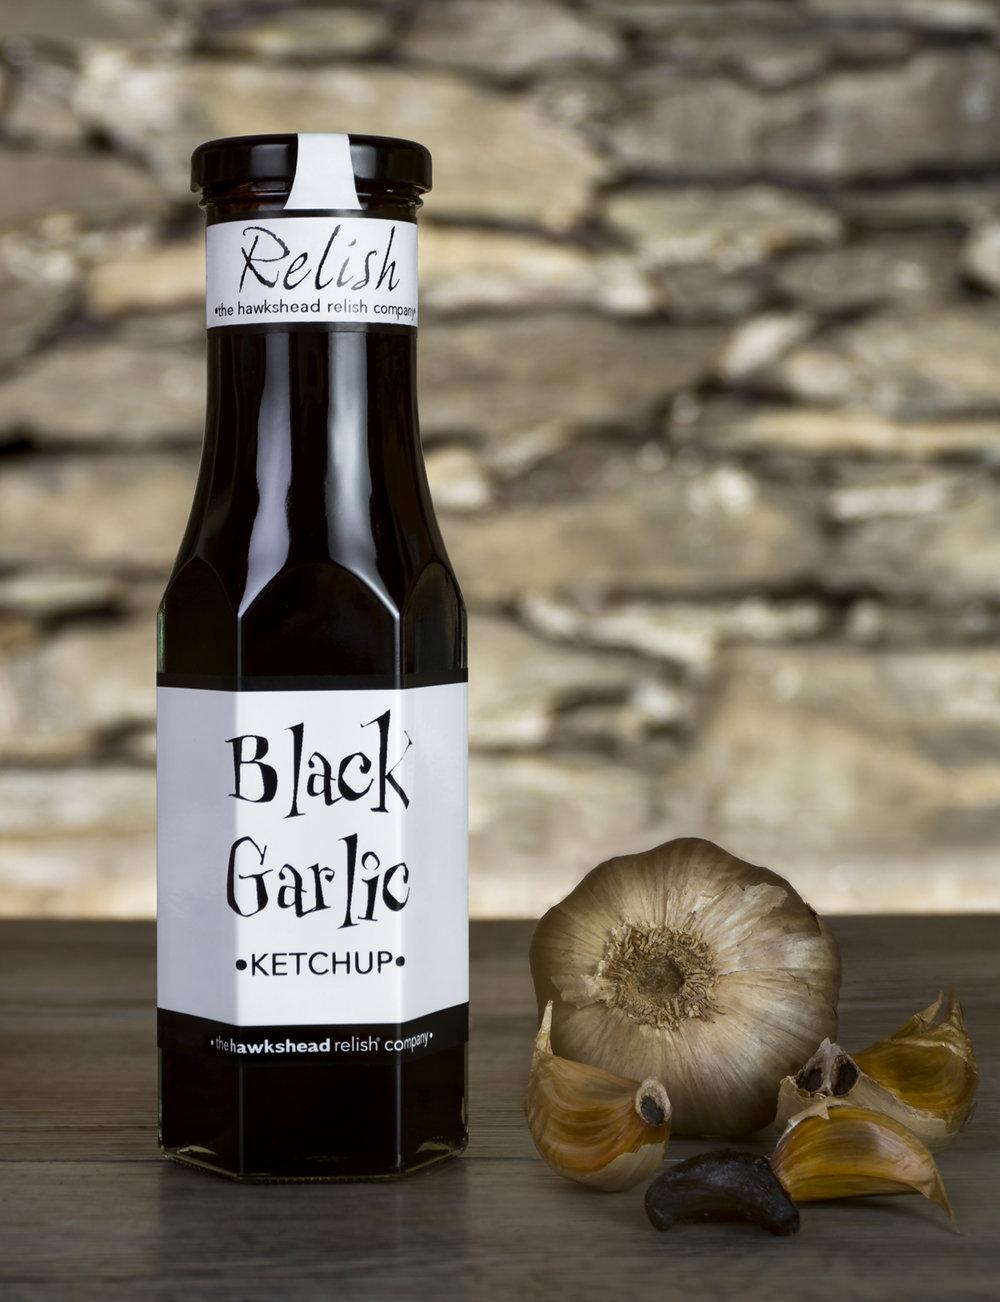 Black_Garlic_Ketchup.jpg